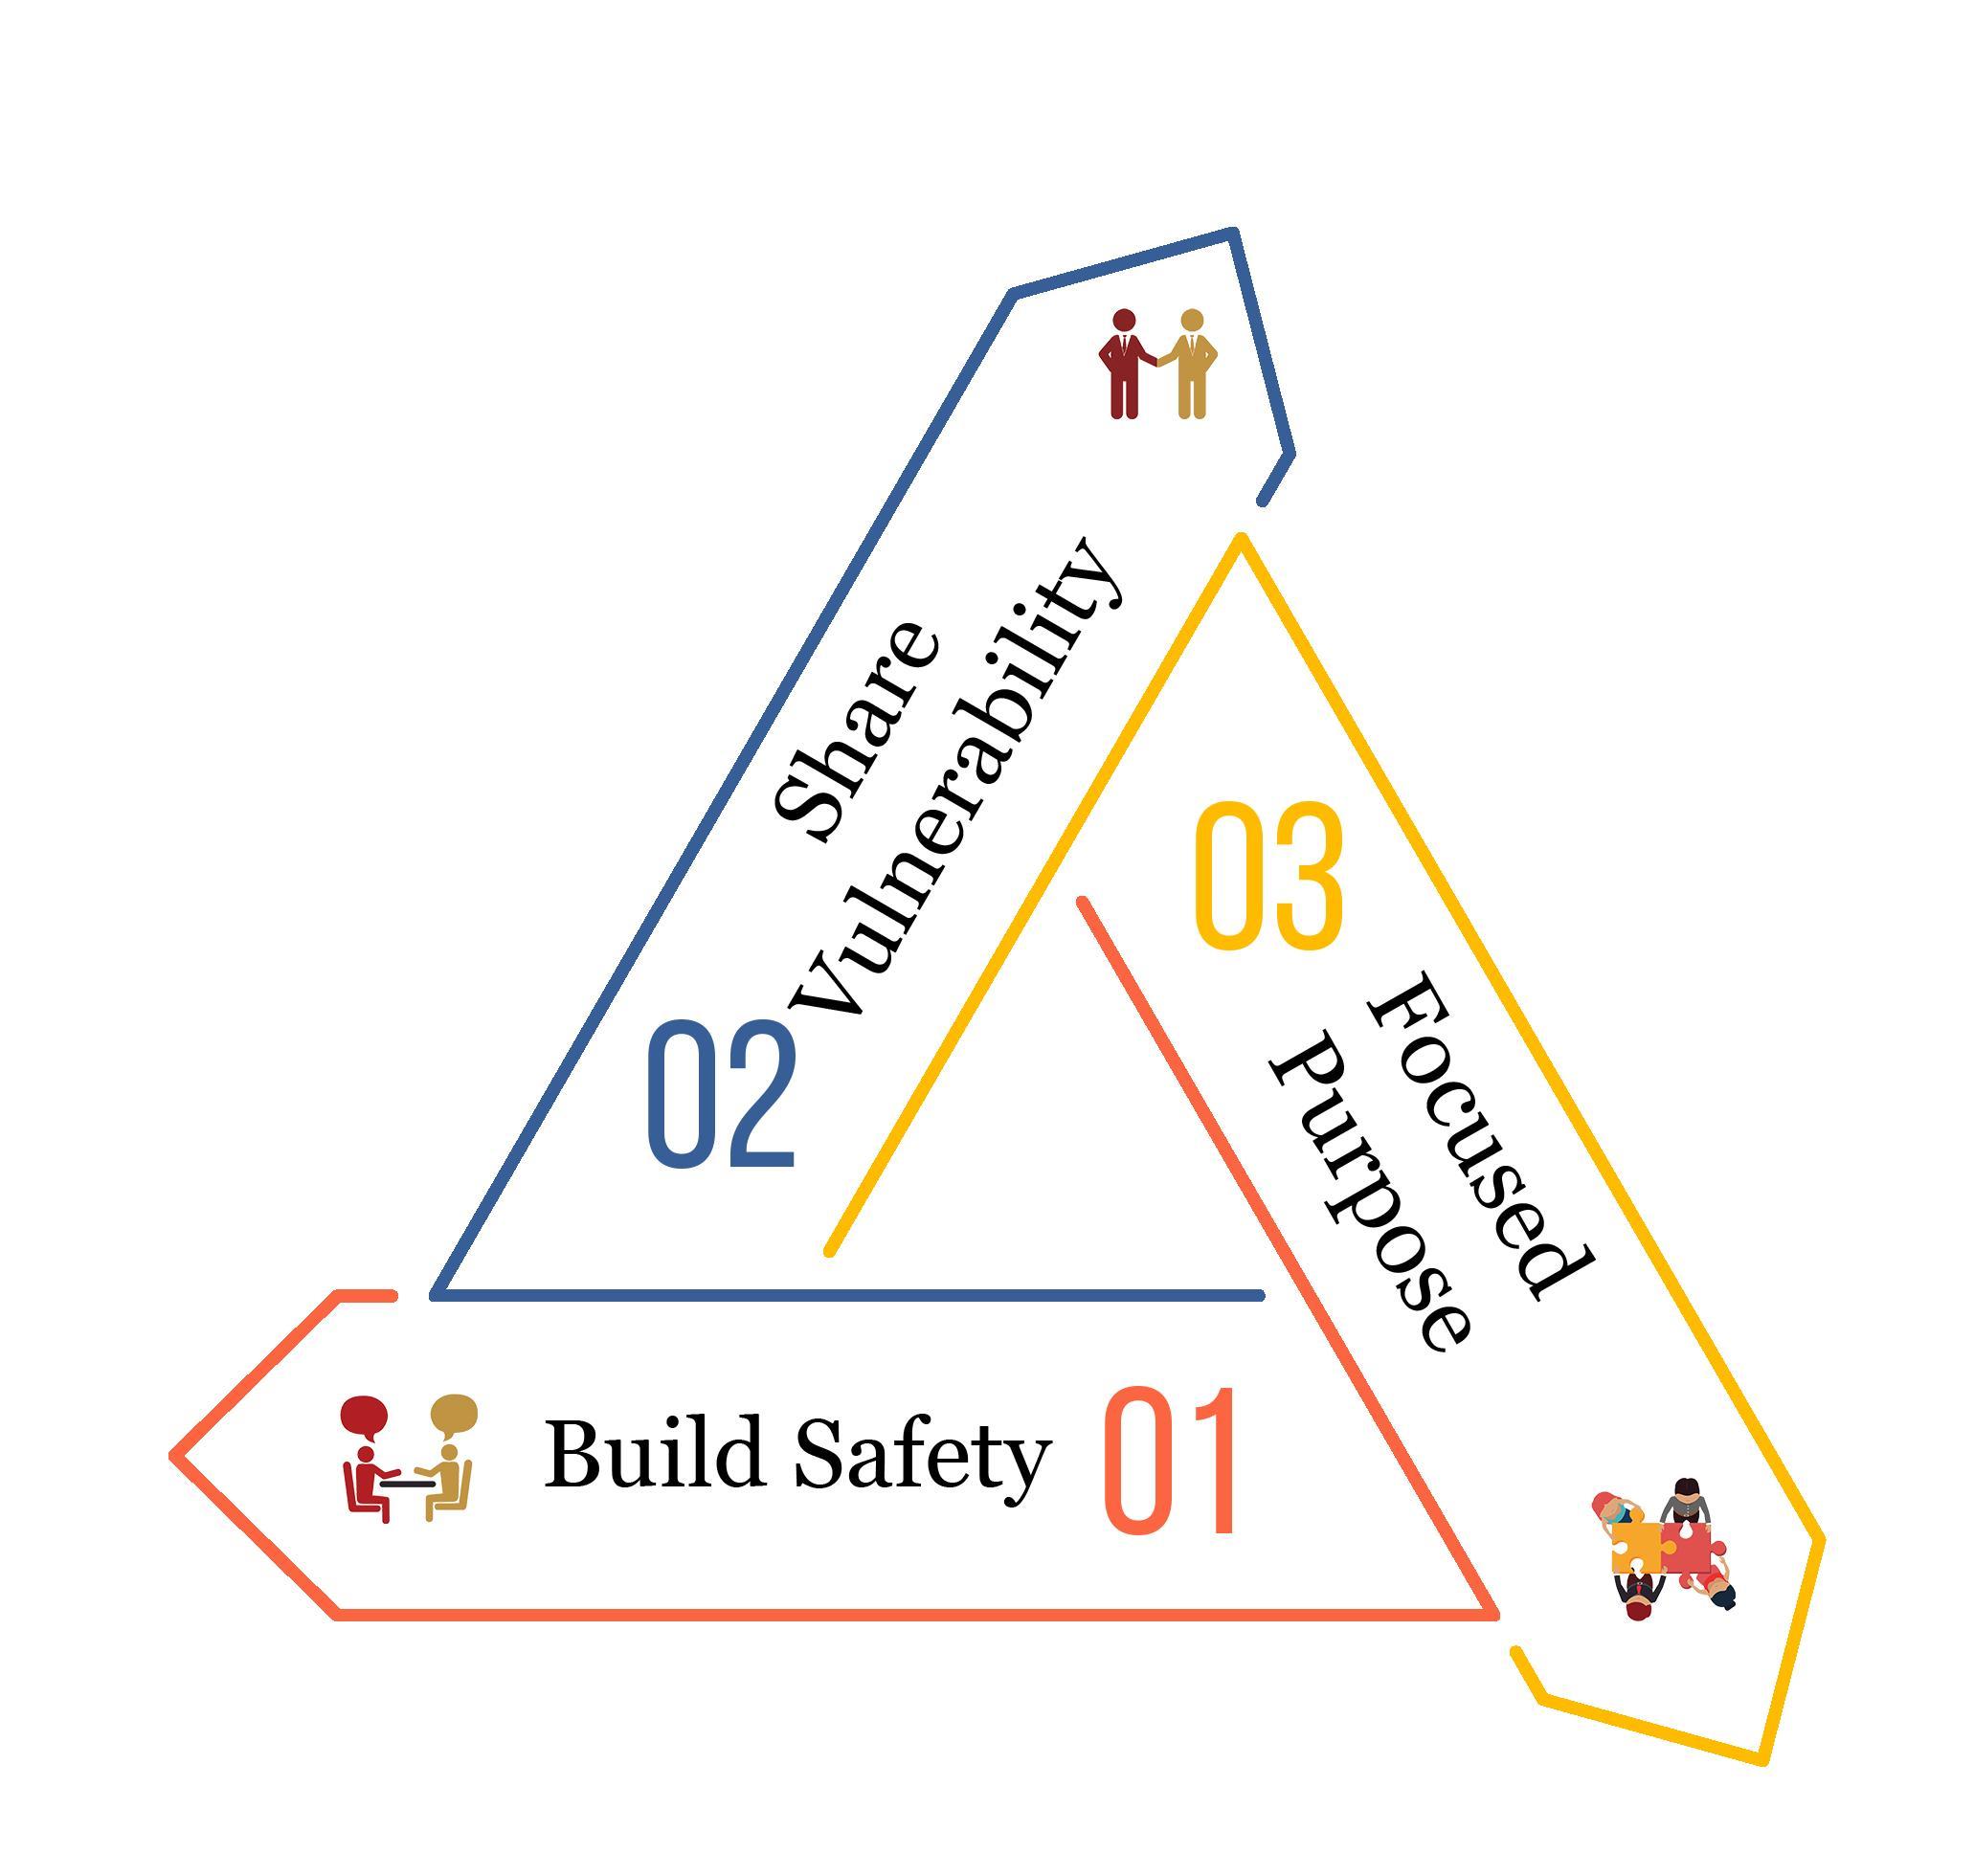 World Class team triangle